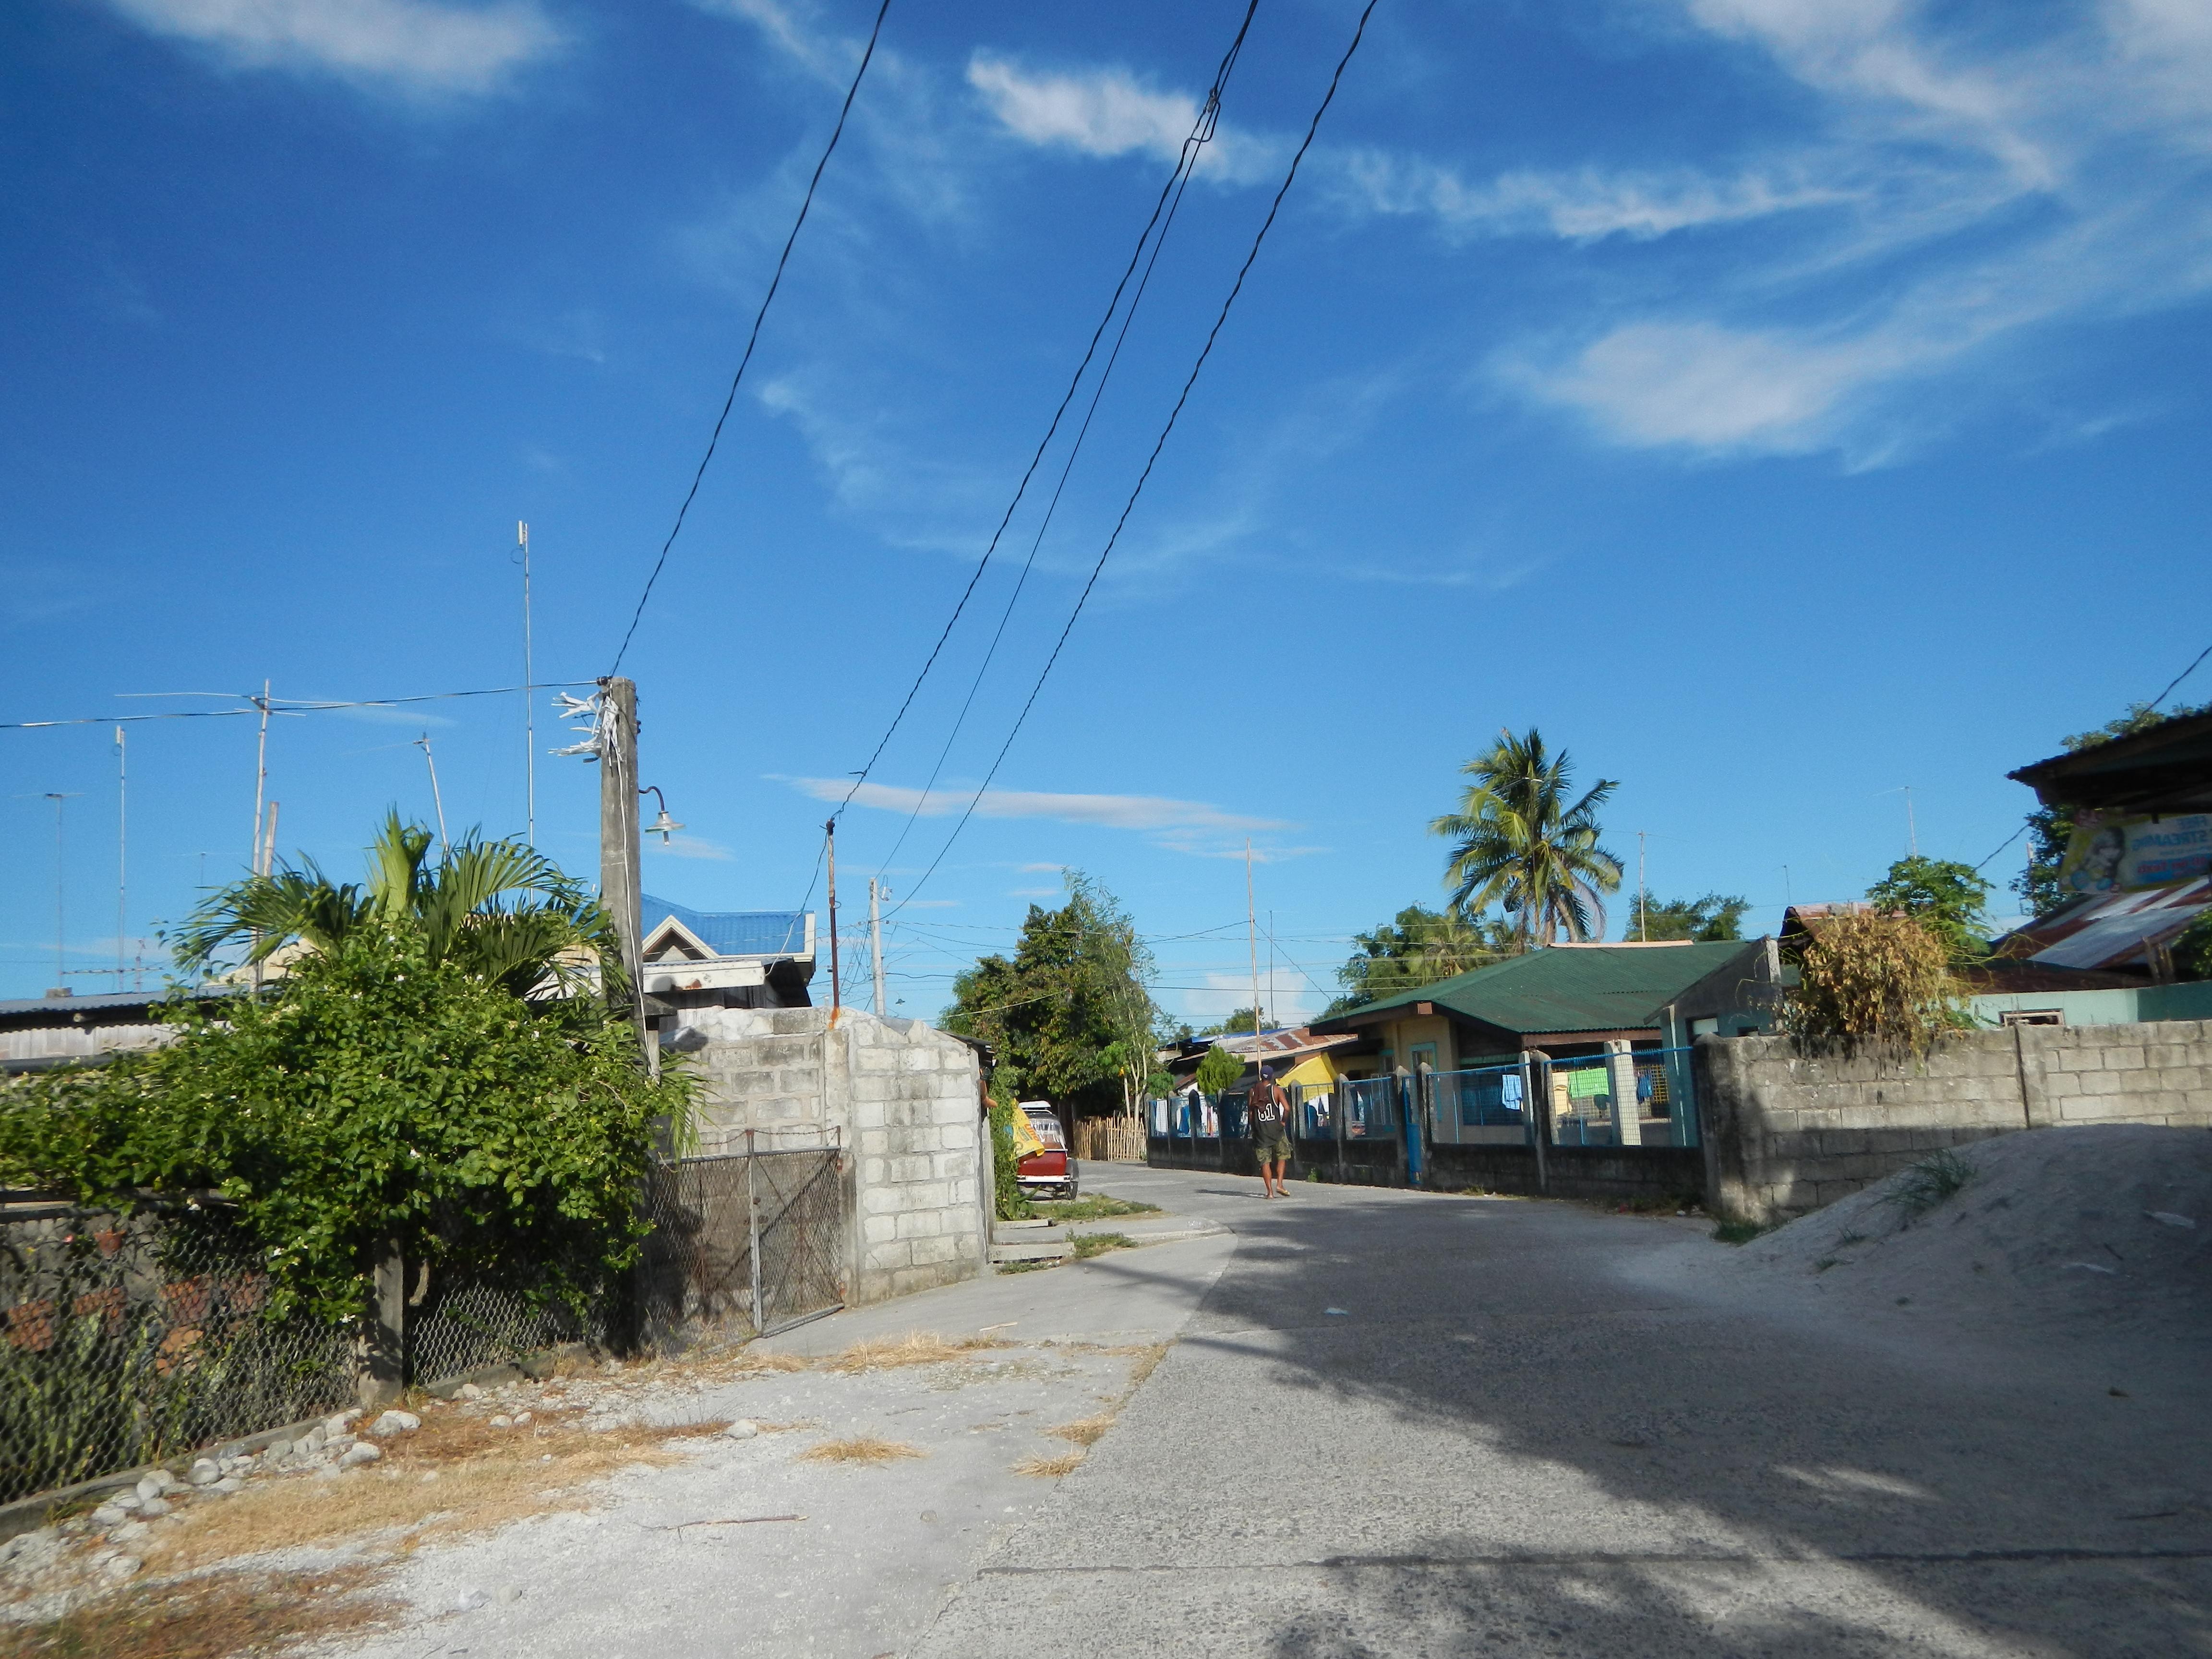 File:7605jfRizal Balanoy La Paz Hall Roads Tarlacfvf 14 ...